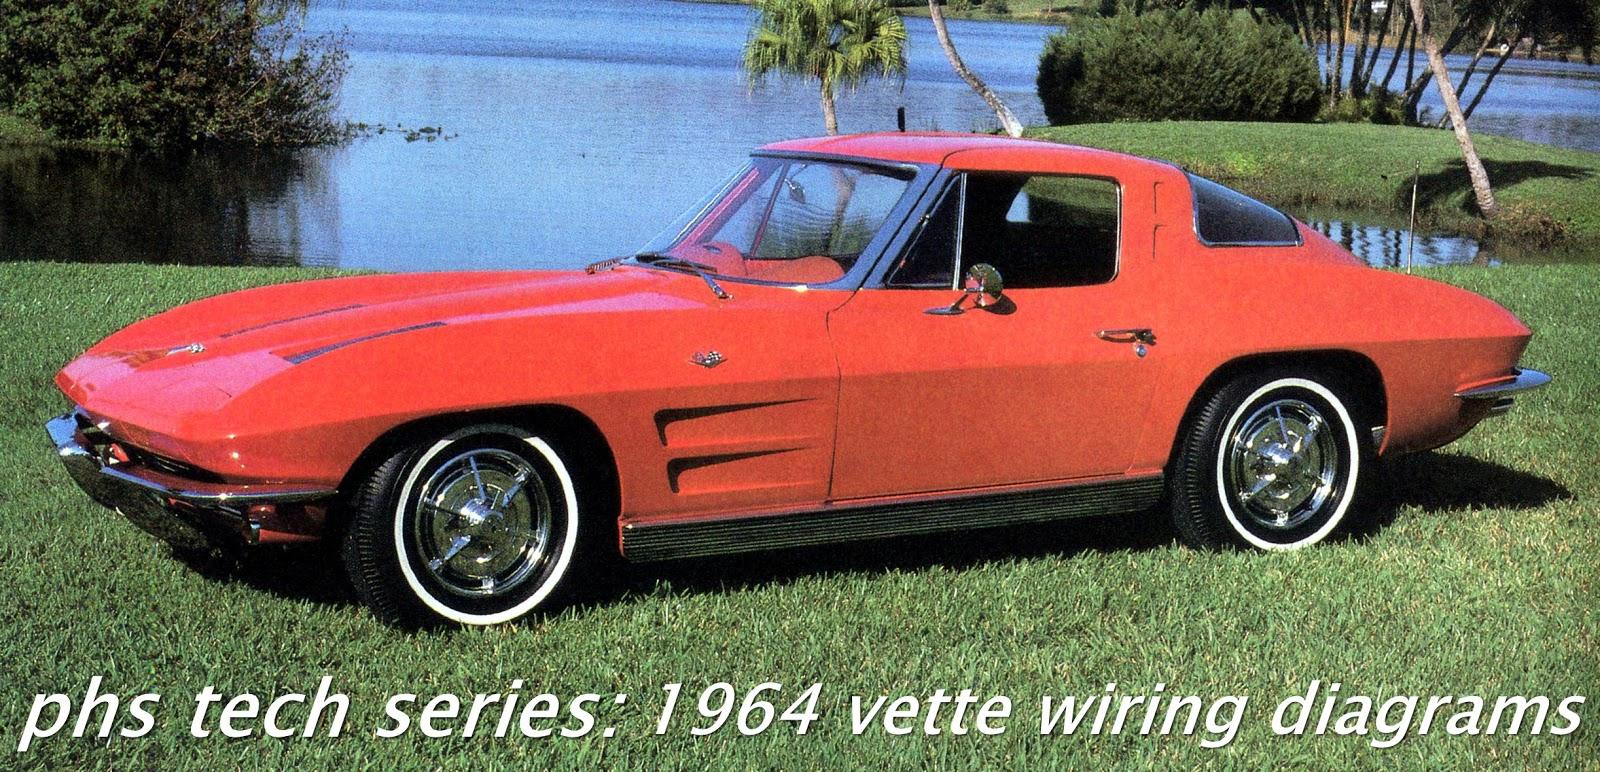 View Mirror Wiring Diagram Further 1964 Pontiac Tempest Wiring Diagram